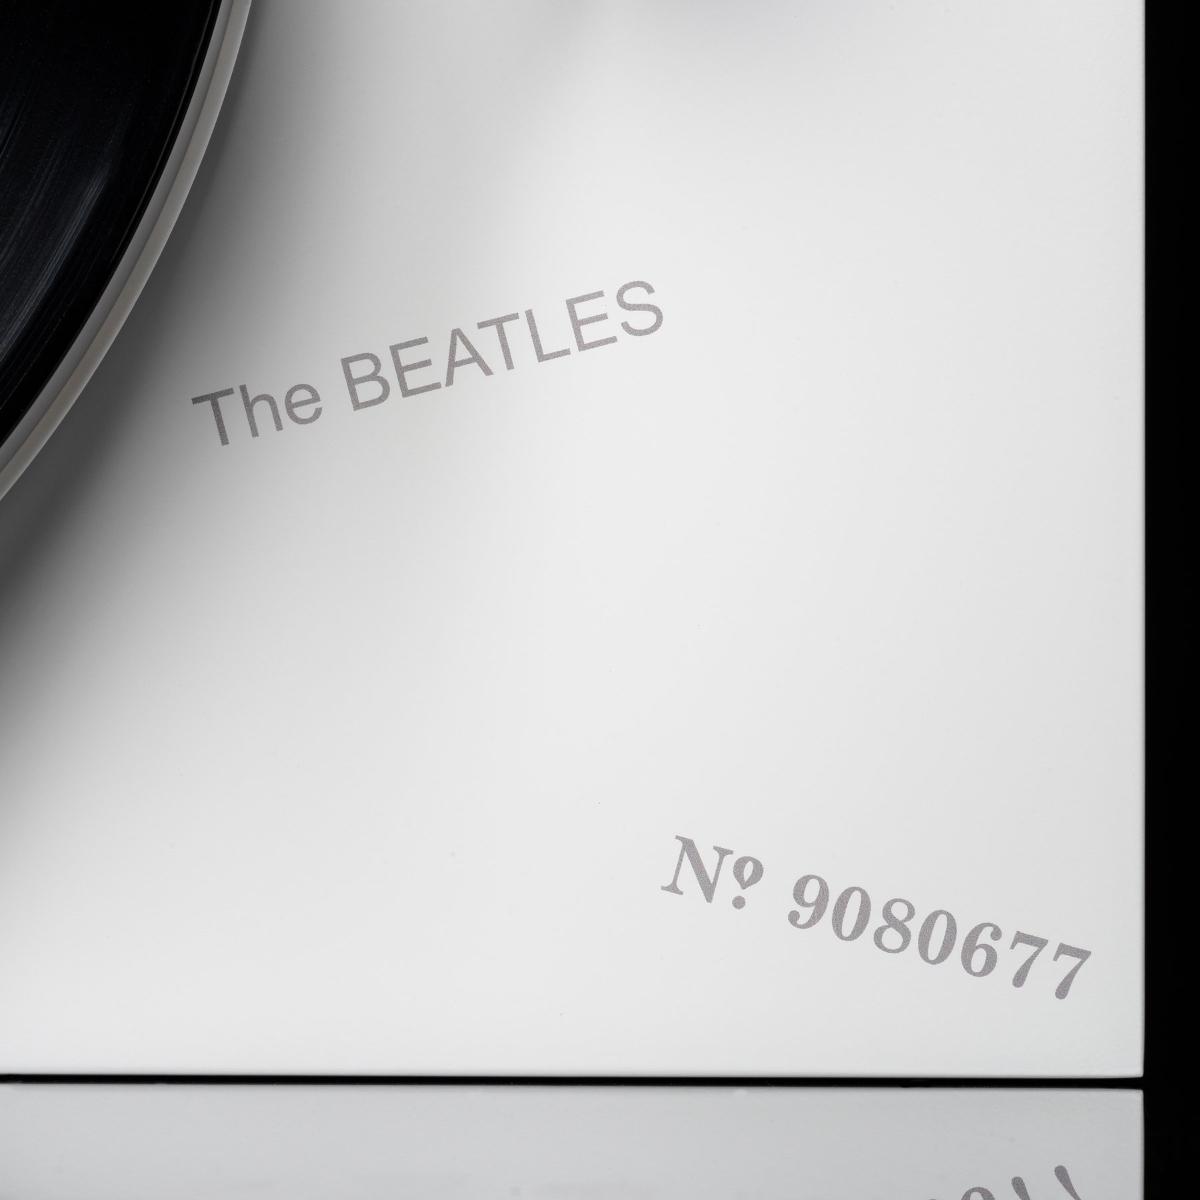 The Beatles White Album Turntable